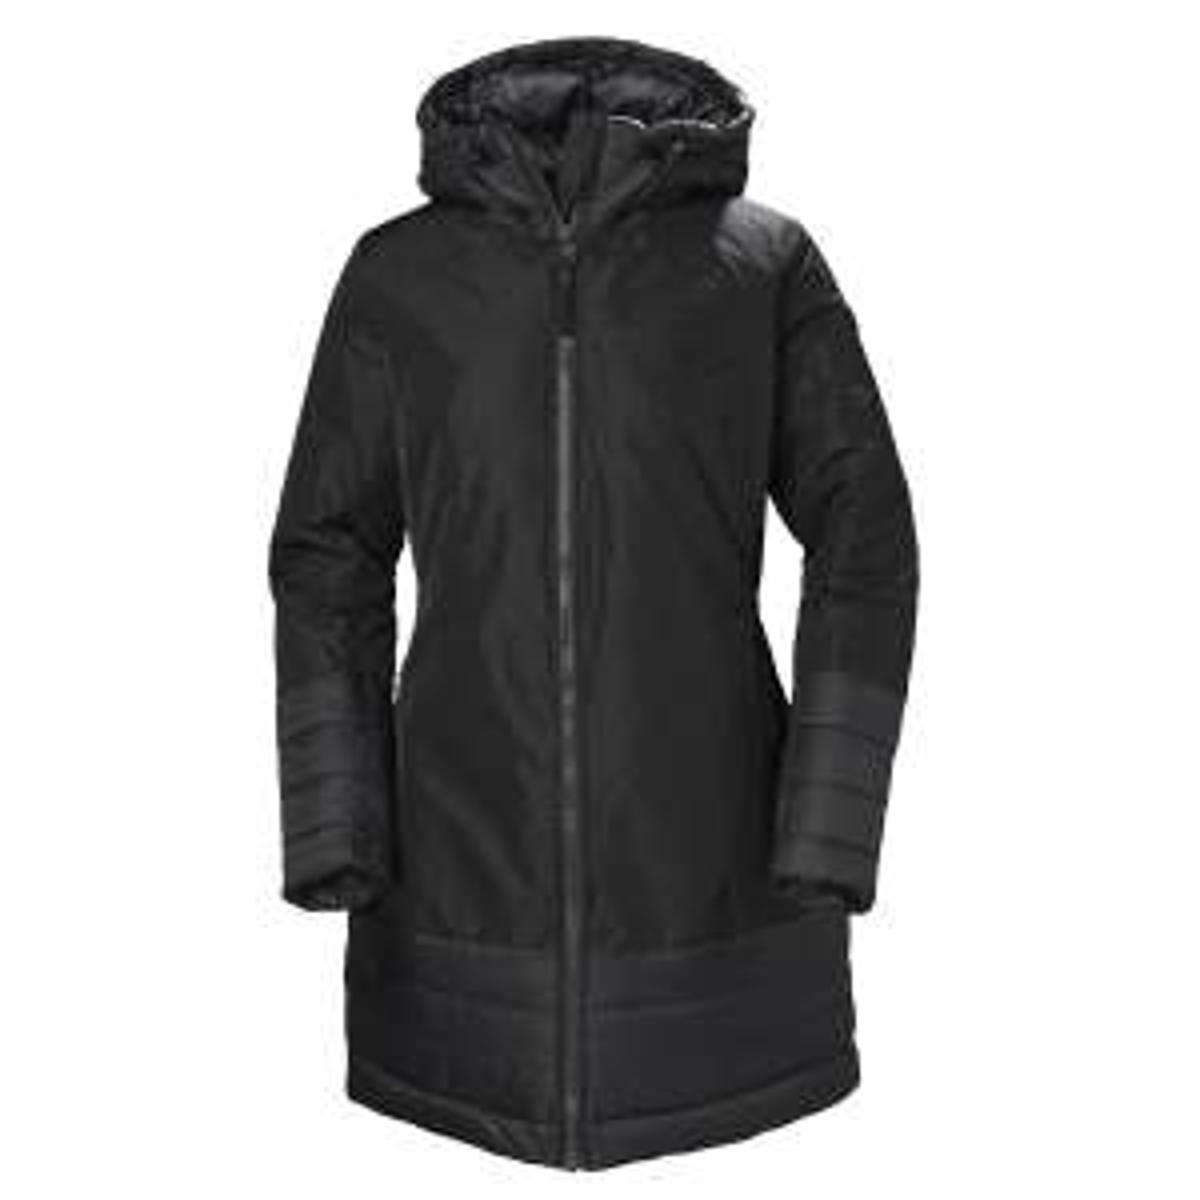 Helly Hansen Women's Parka W Mayen Coat *XL ONLY* low stock item be quick! @ Amazon